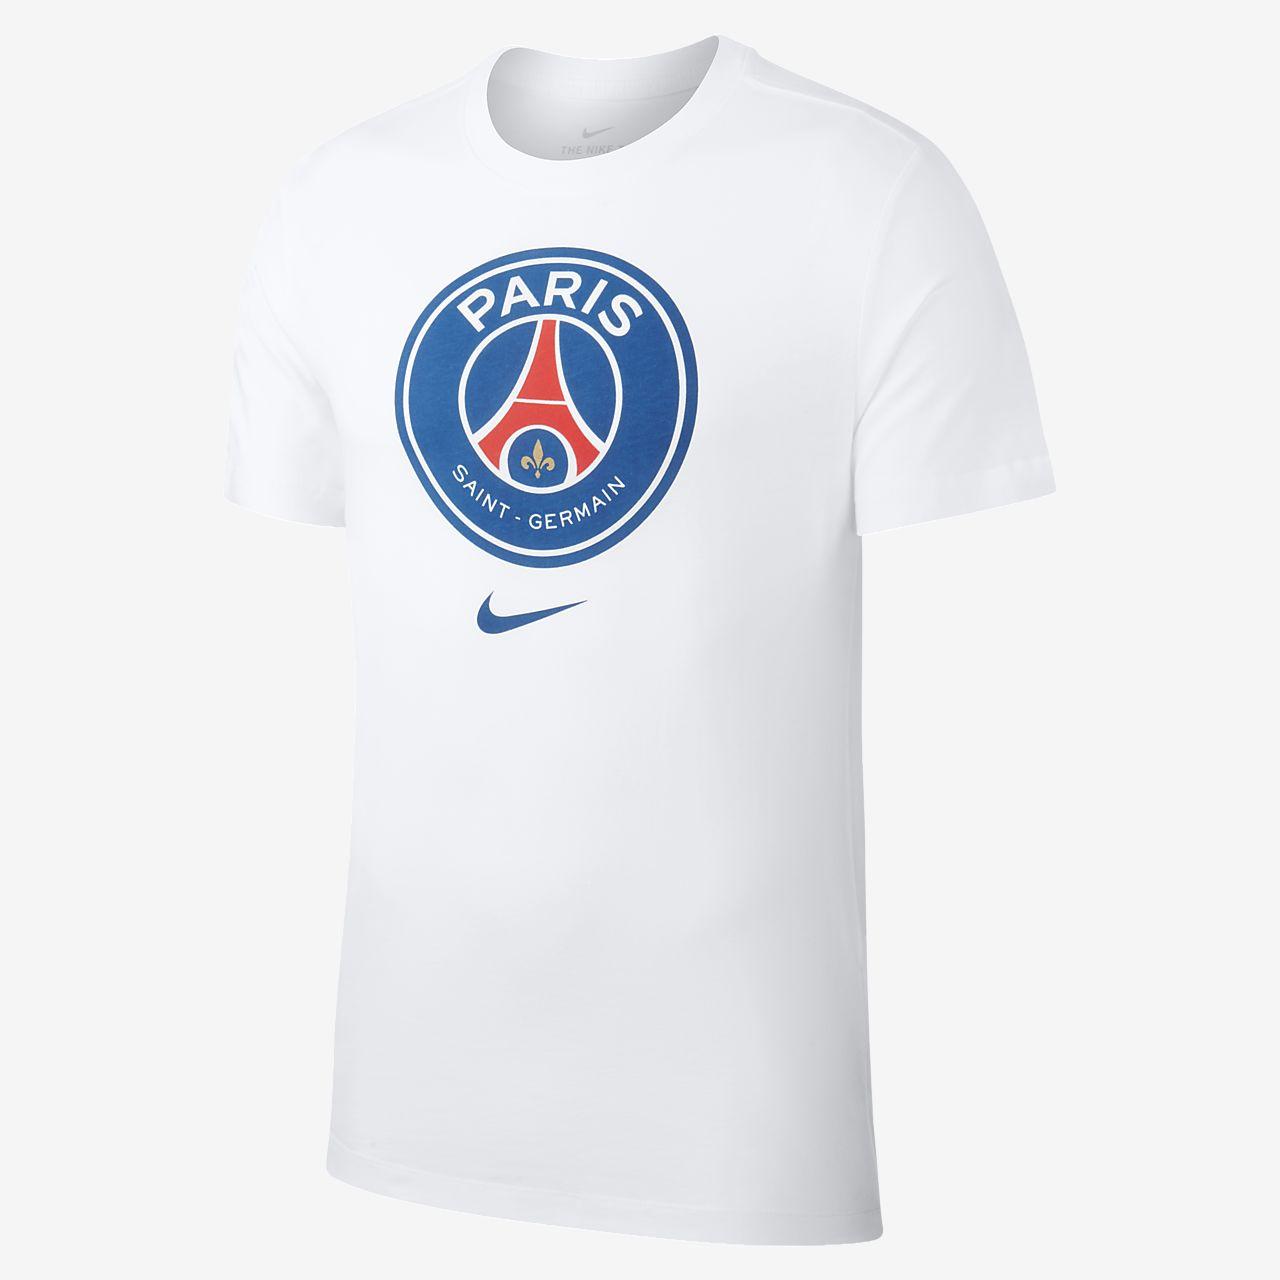 d9fe567c3 Paris Saint-Germain Men's T-Shirt. Nike.com DK